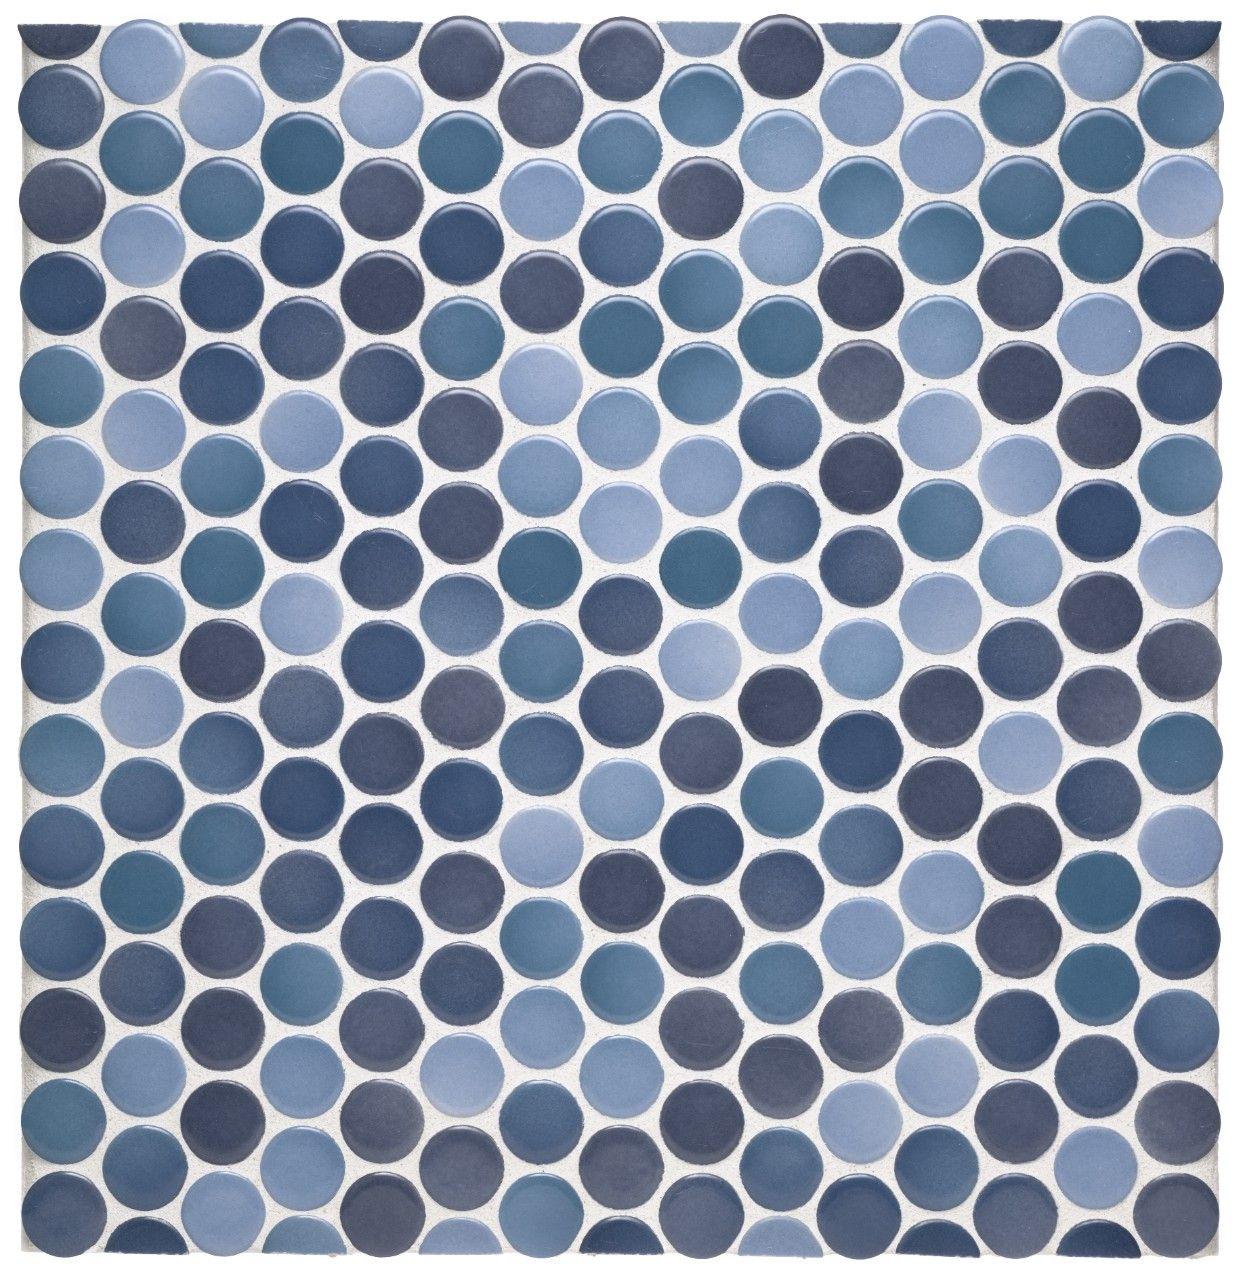 penny tile kitchen collections waterworks backsplash tile penny tile kitchen collections waterworks backsplash